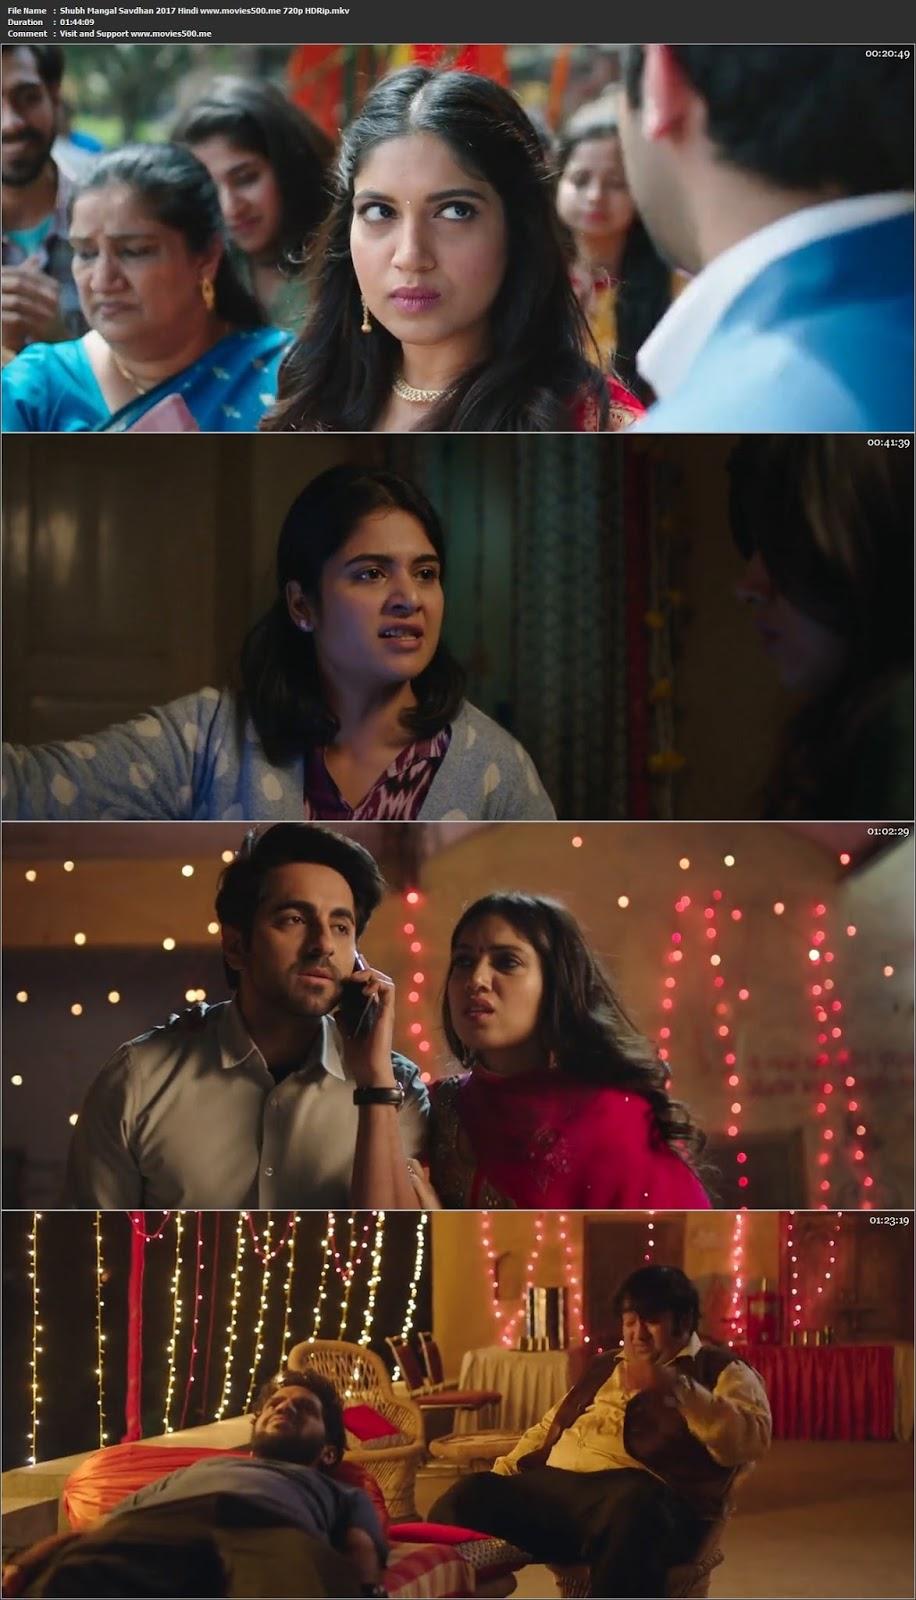 Shubh Mangal Saavdhan 2017 Hindi Movie Desi DVDRip 720p at newbtcbank.com